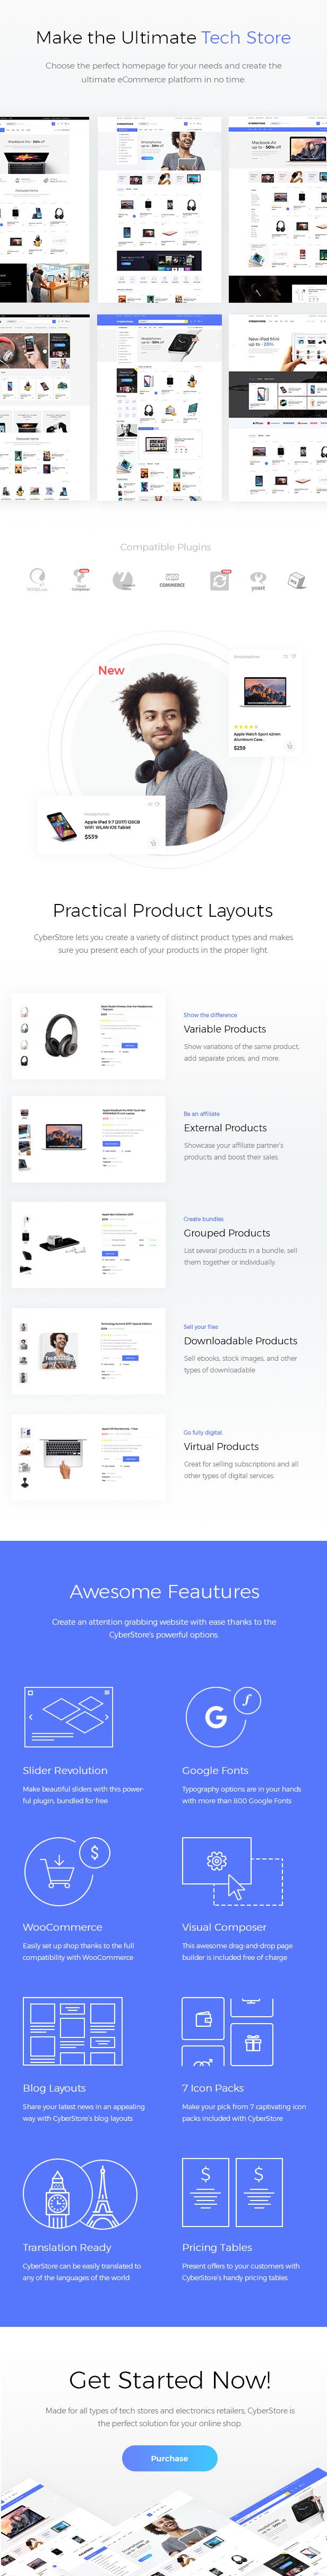 WordPress主题 CyberStore WooCommerce电子商务零售商的现代商城汉化主题[更新至v1.1]